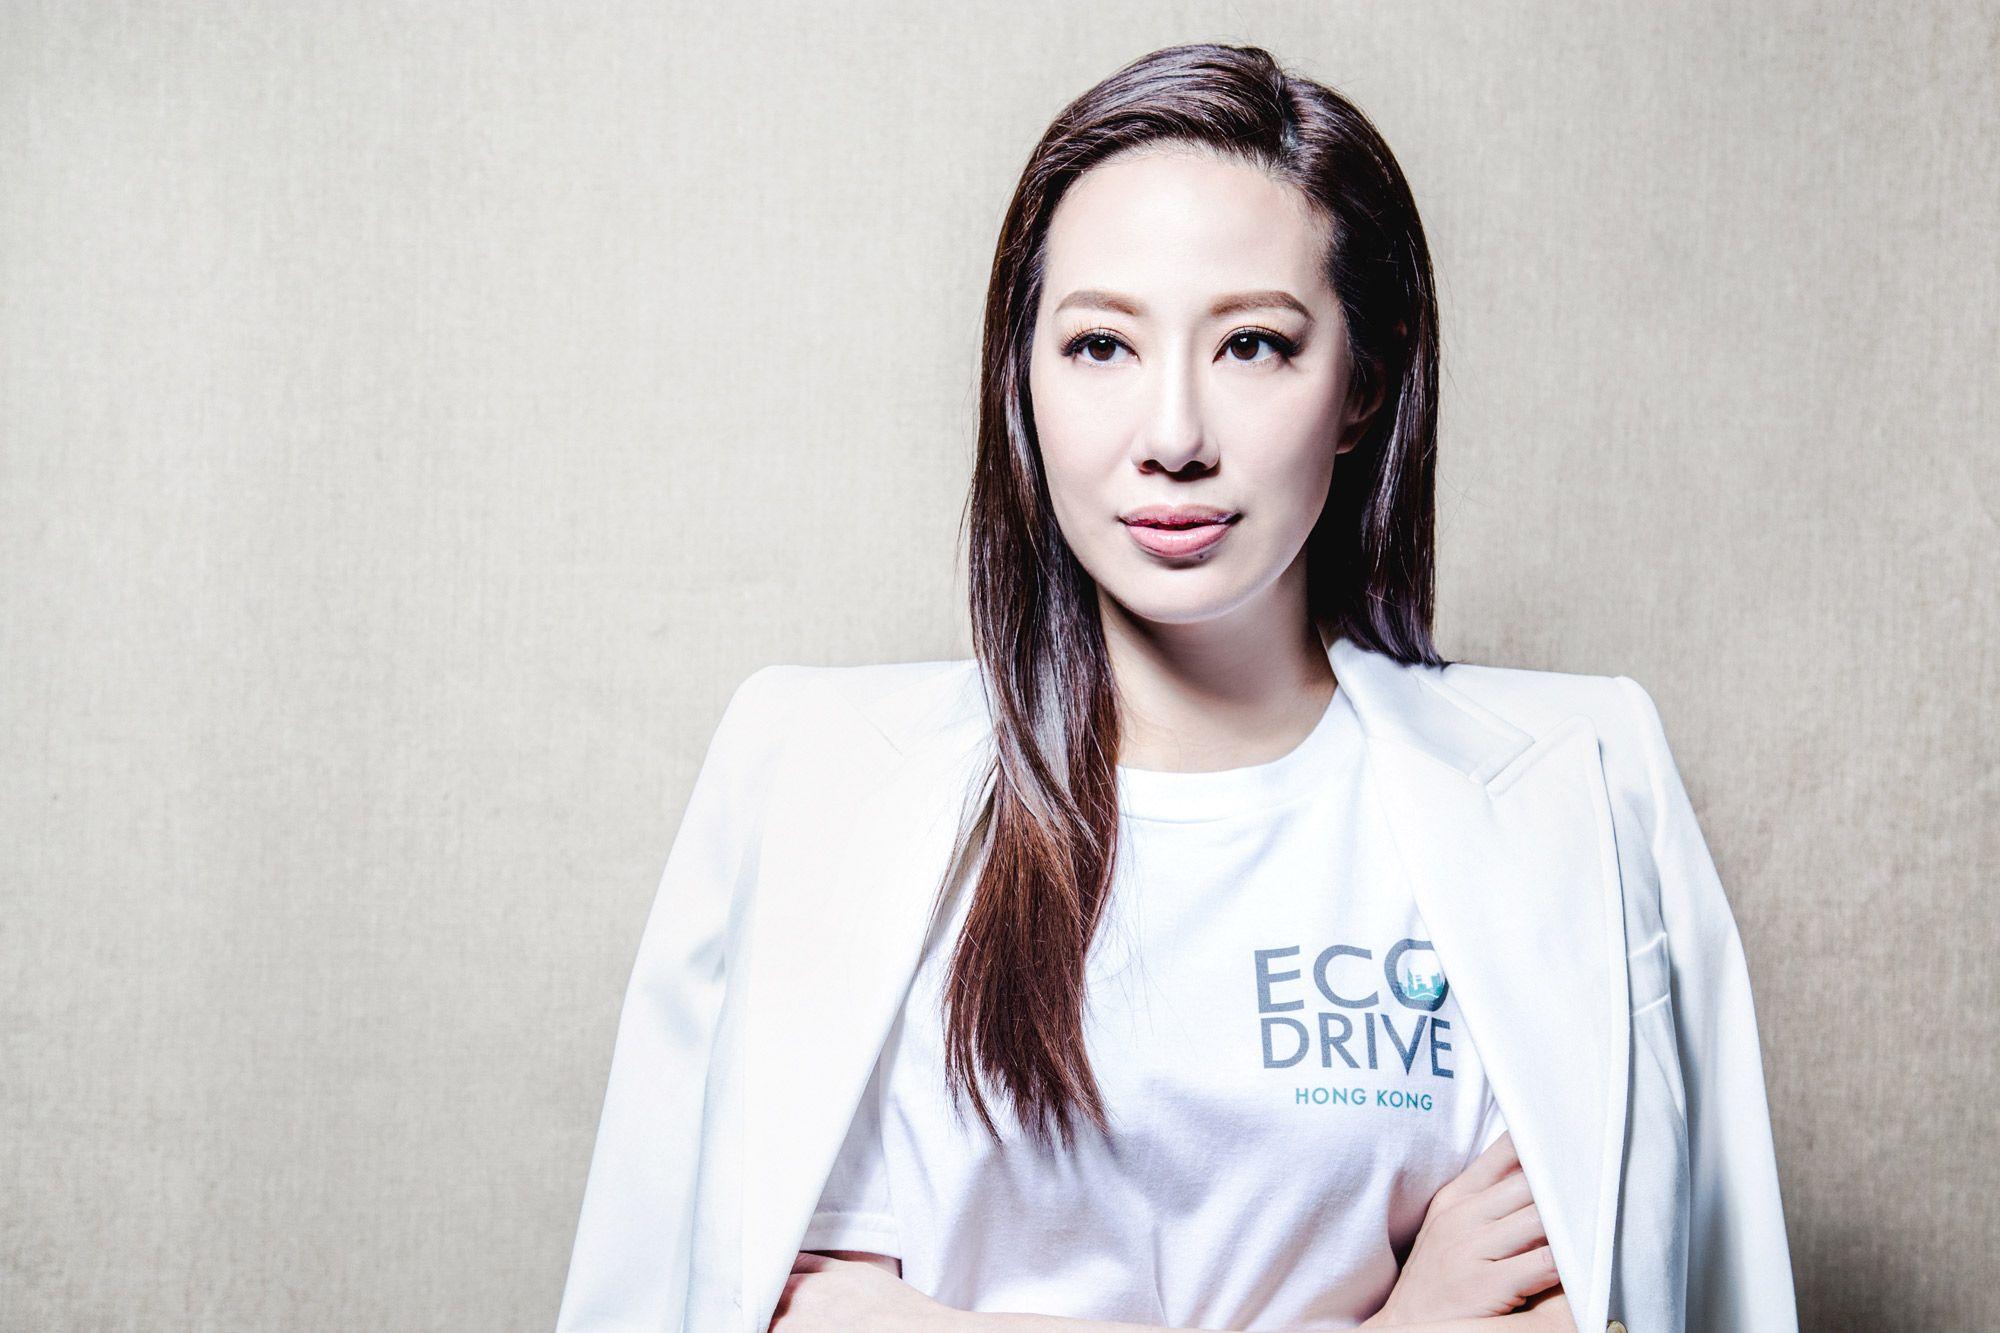 Eco Warriors: Cissy Wang of EcoDrive Hong Kong